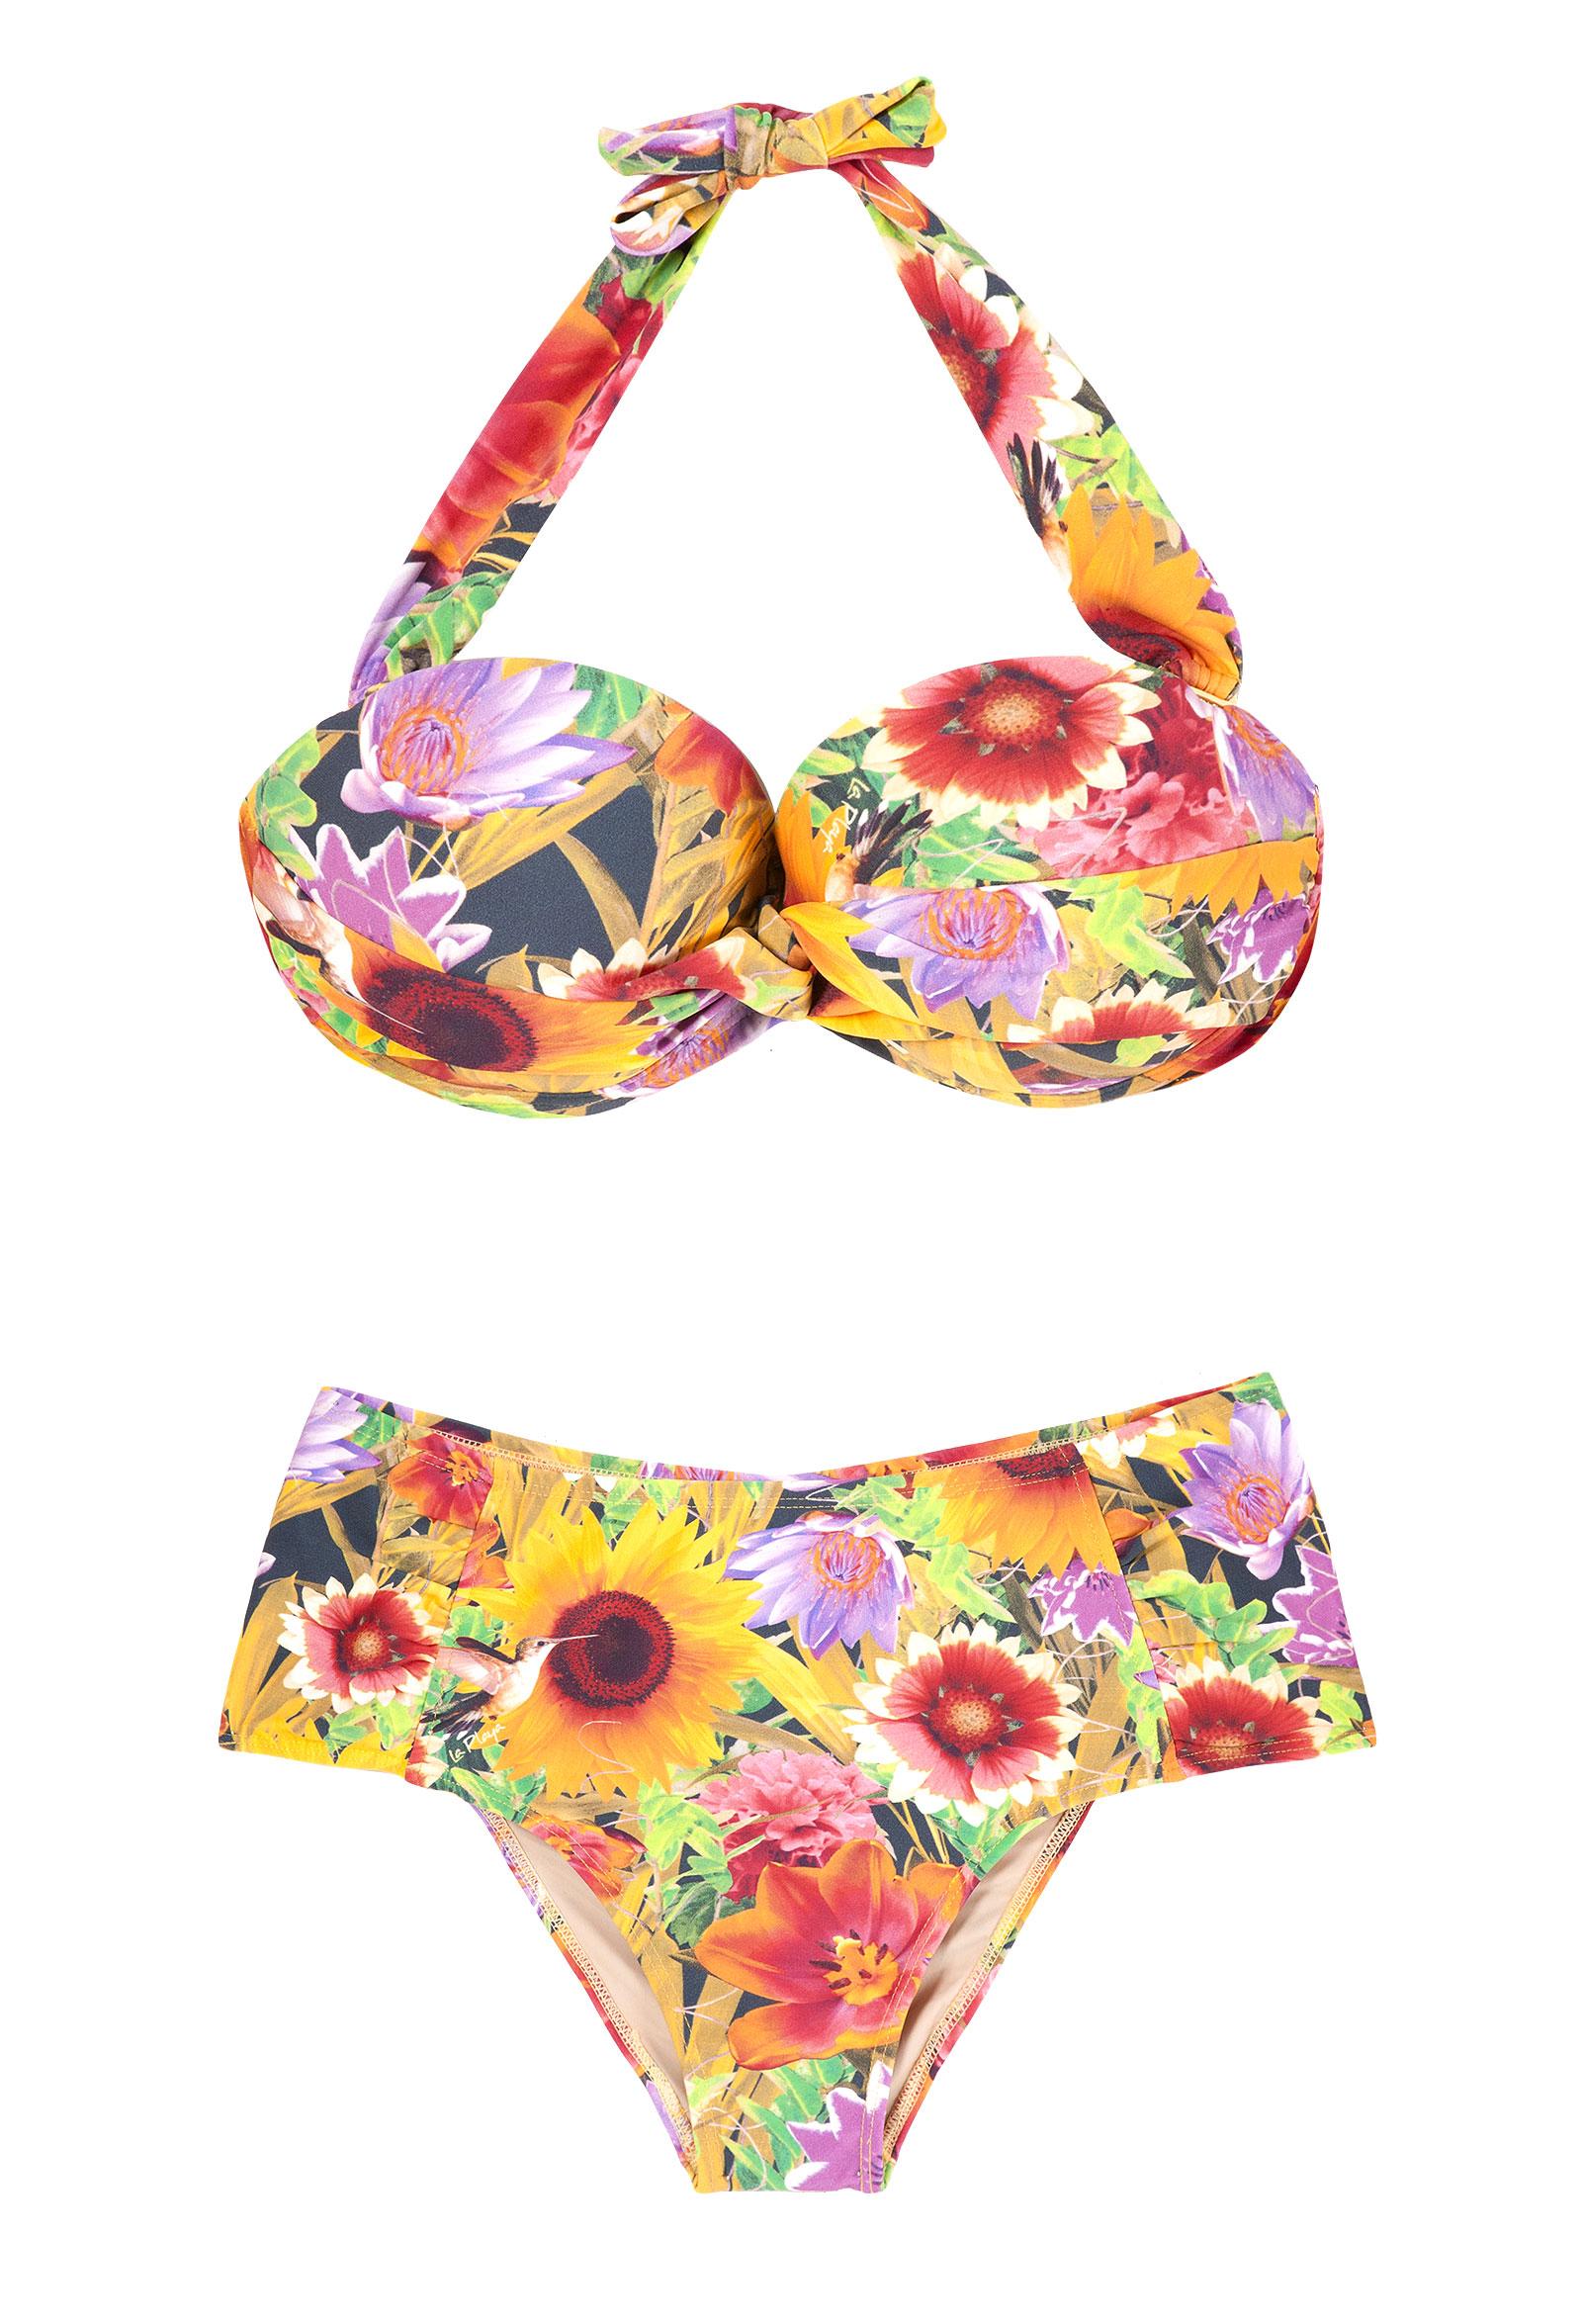 cf3ae6357 Biquini Bikini Plus Size - Plus Girassol - Marca   Grife La Playa